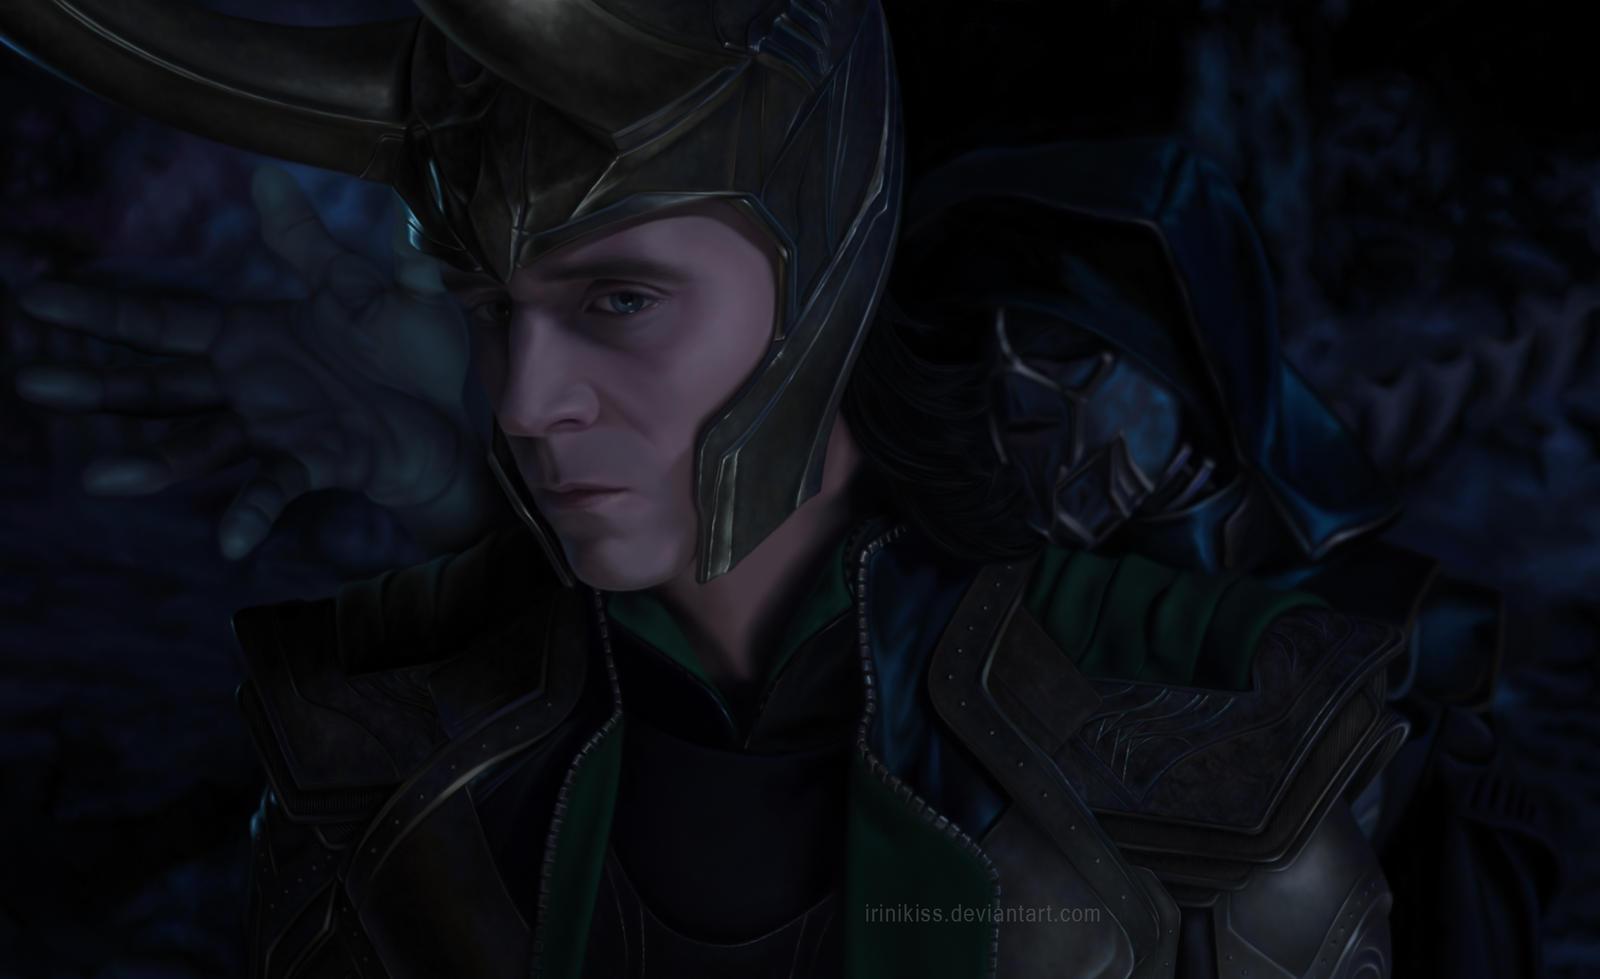 Loki-5 by IriniKiss